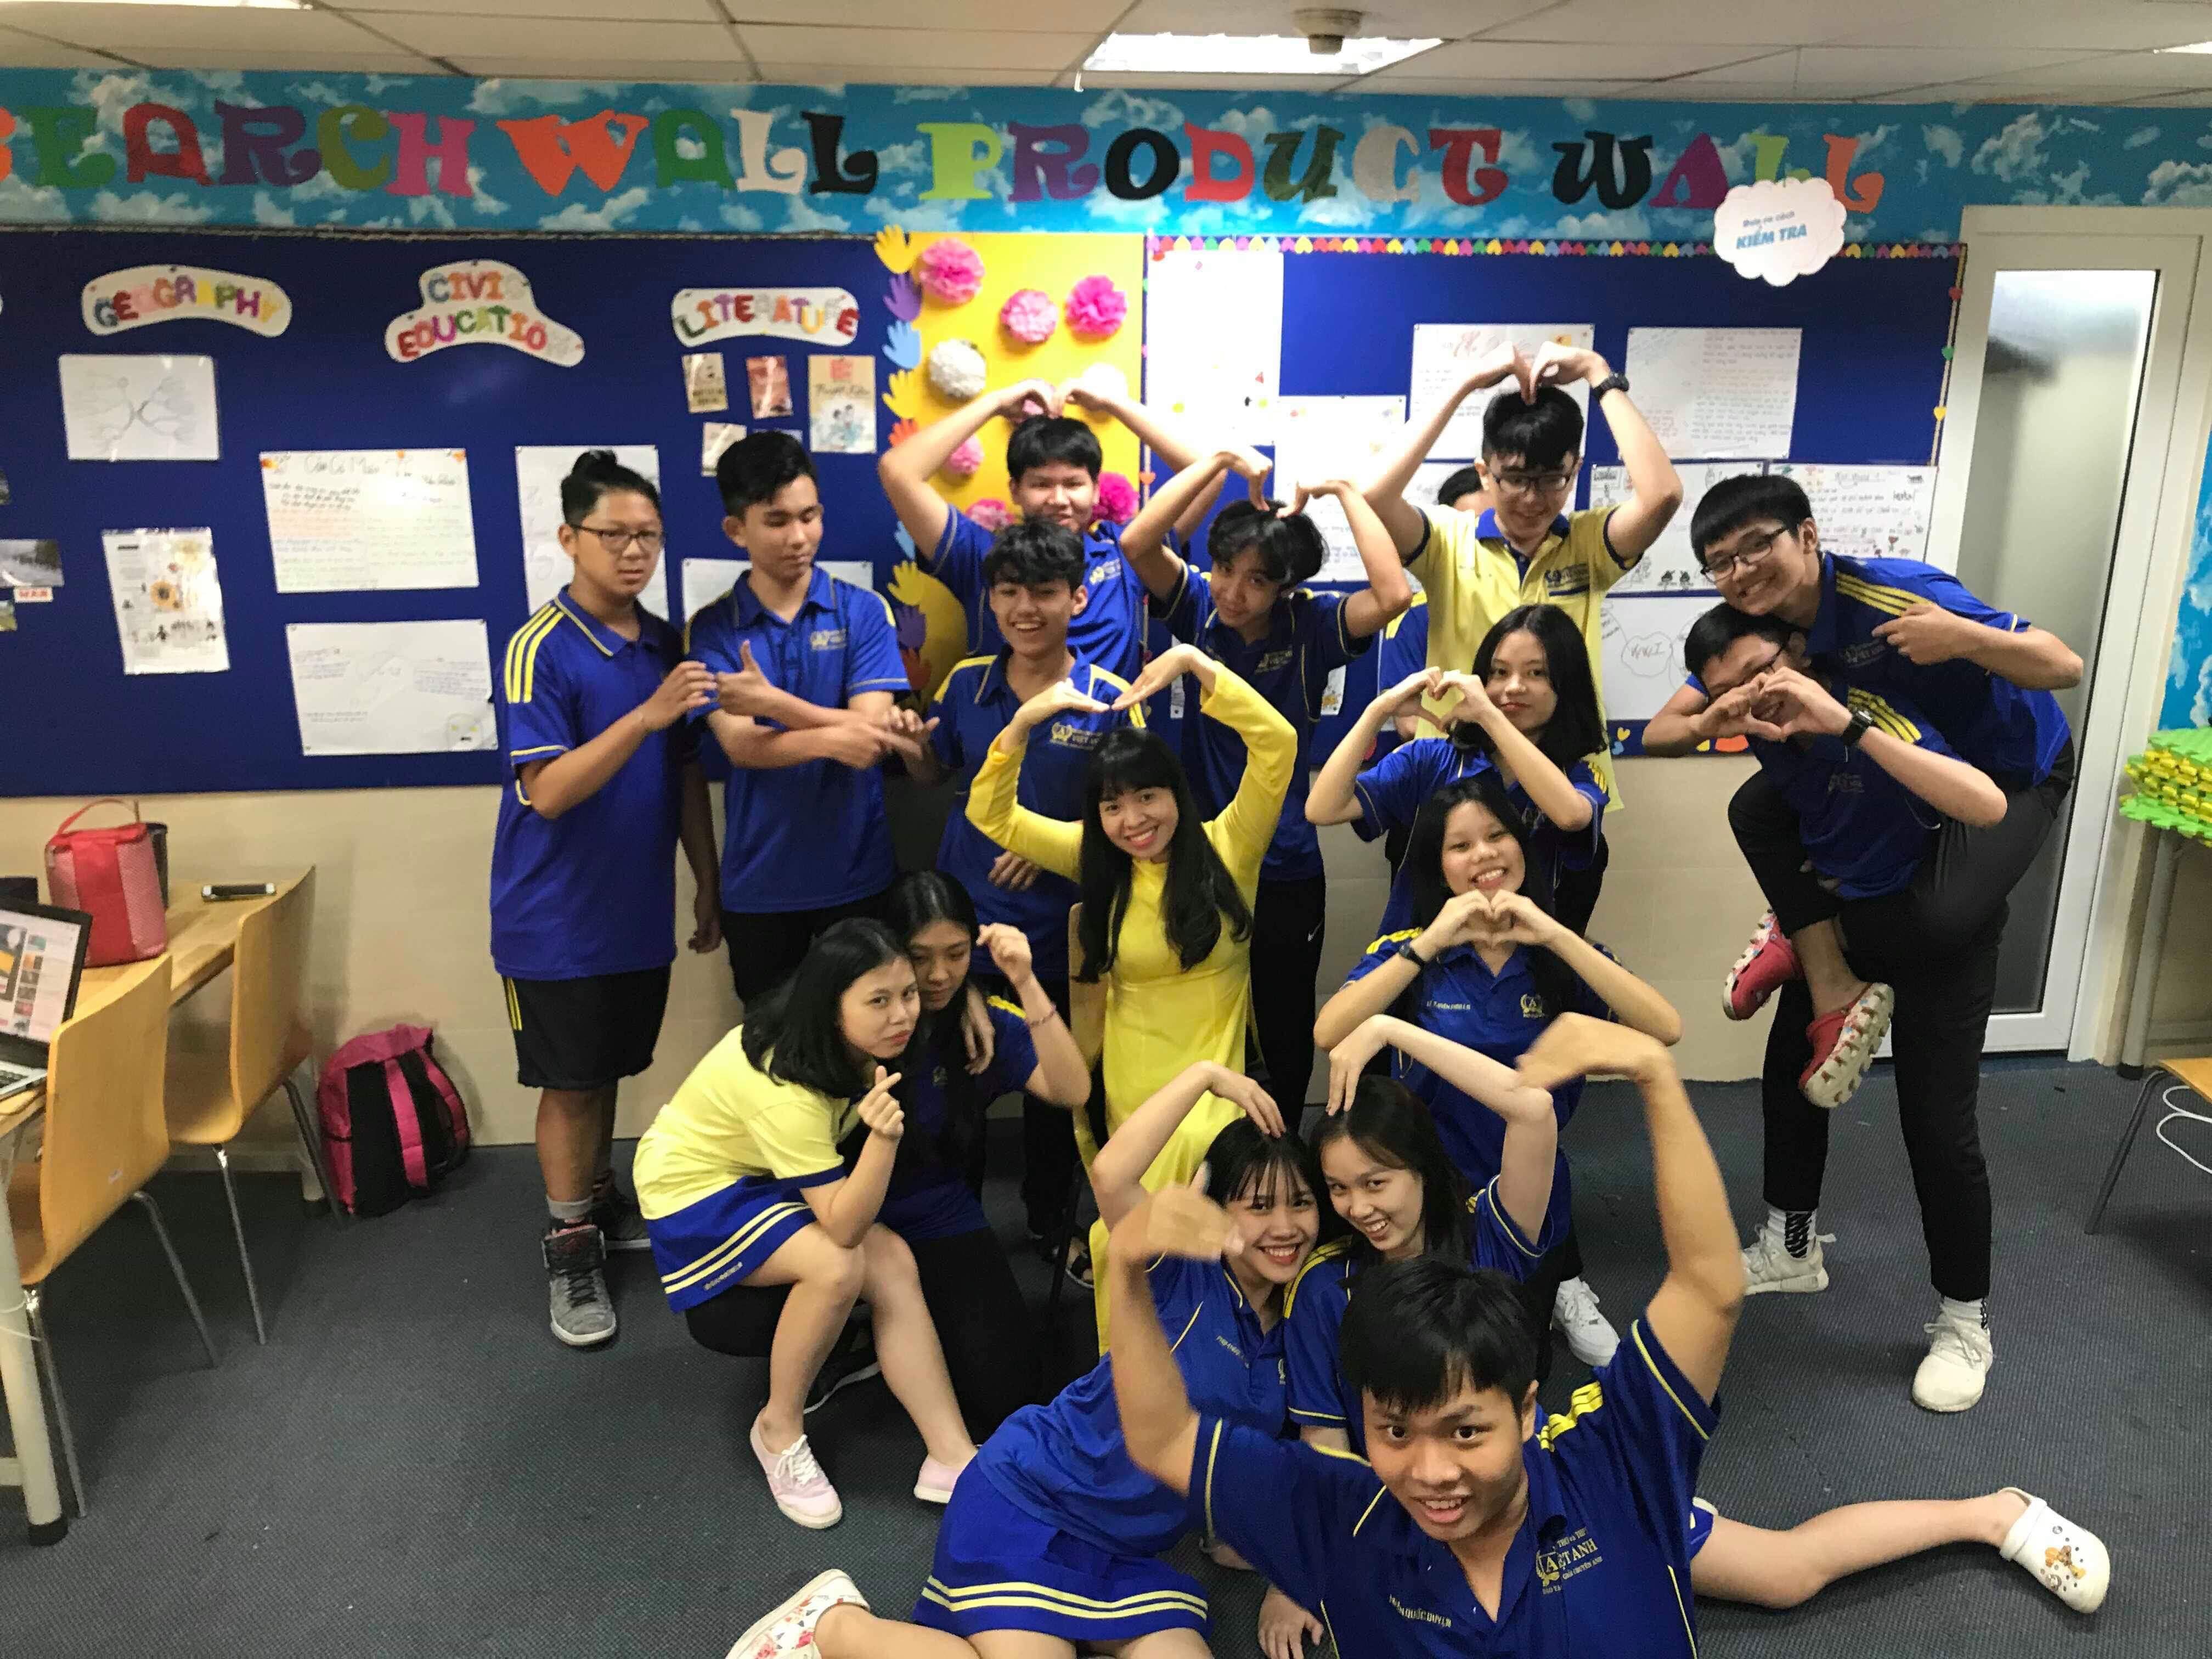 Khoảnh Khắc Thầy Trò 2018 – Ảnh dự thi lớp 11A1